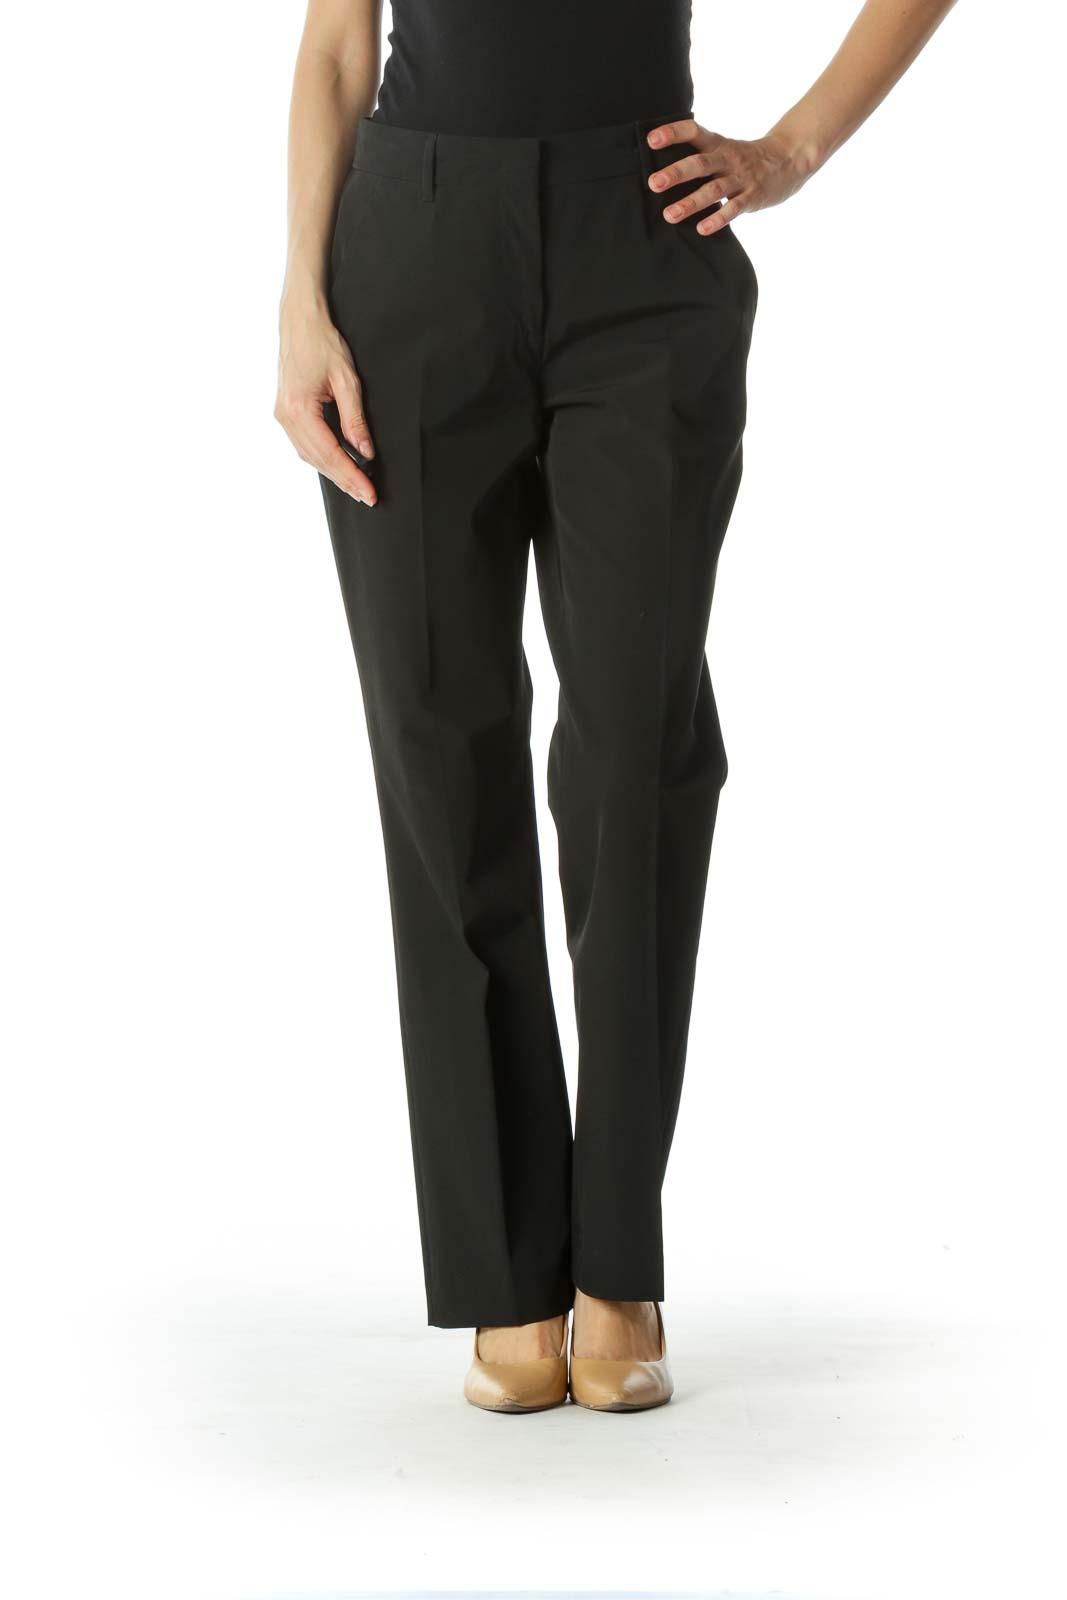 Black Designer Mid-Rise Dress Pant Front